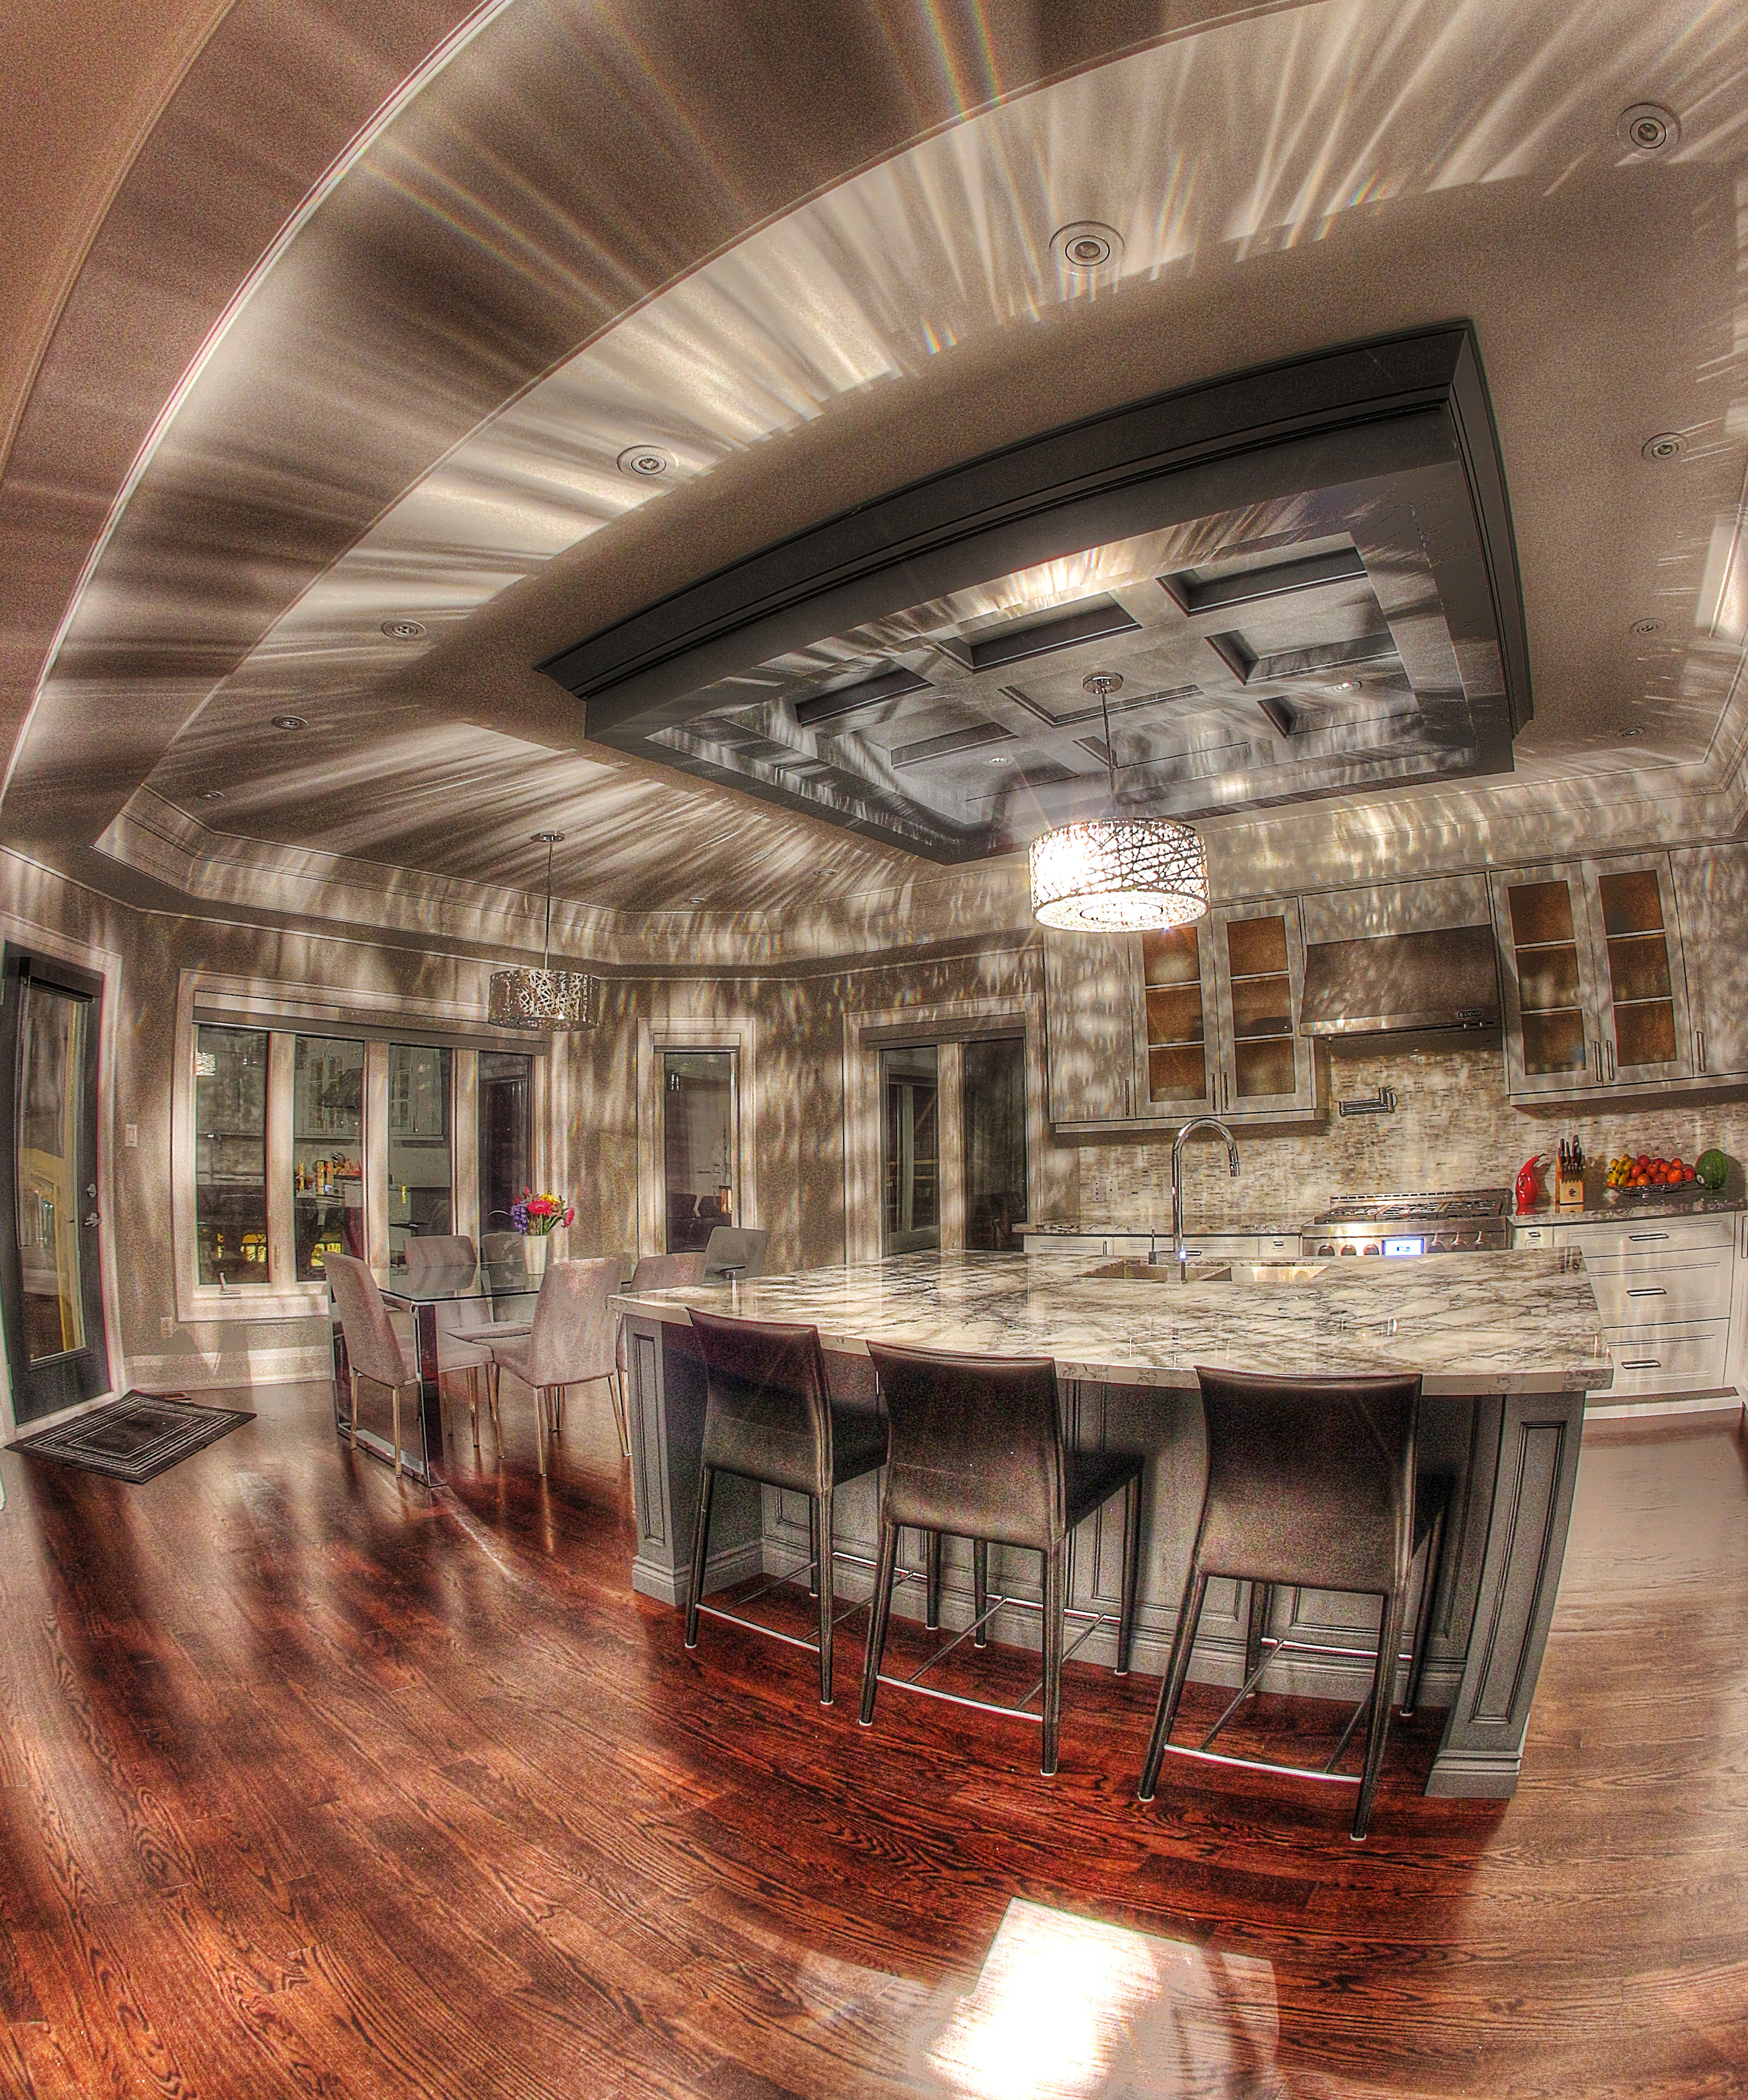 woodward kitchenight